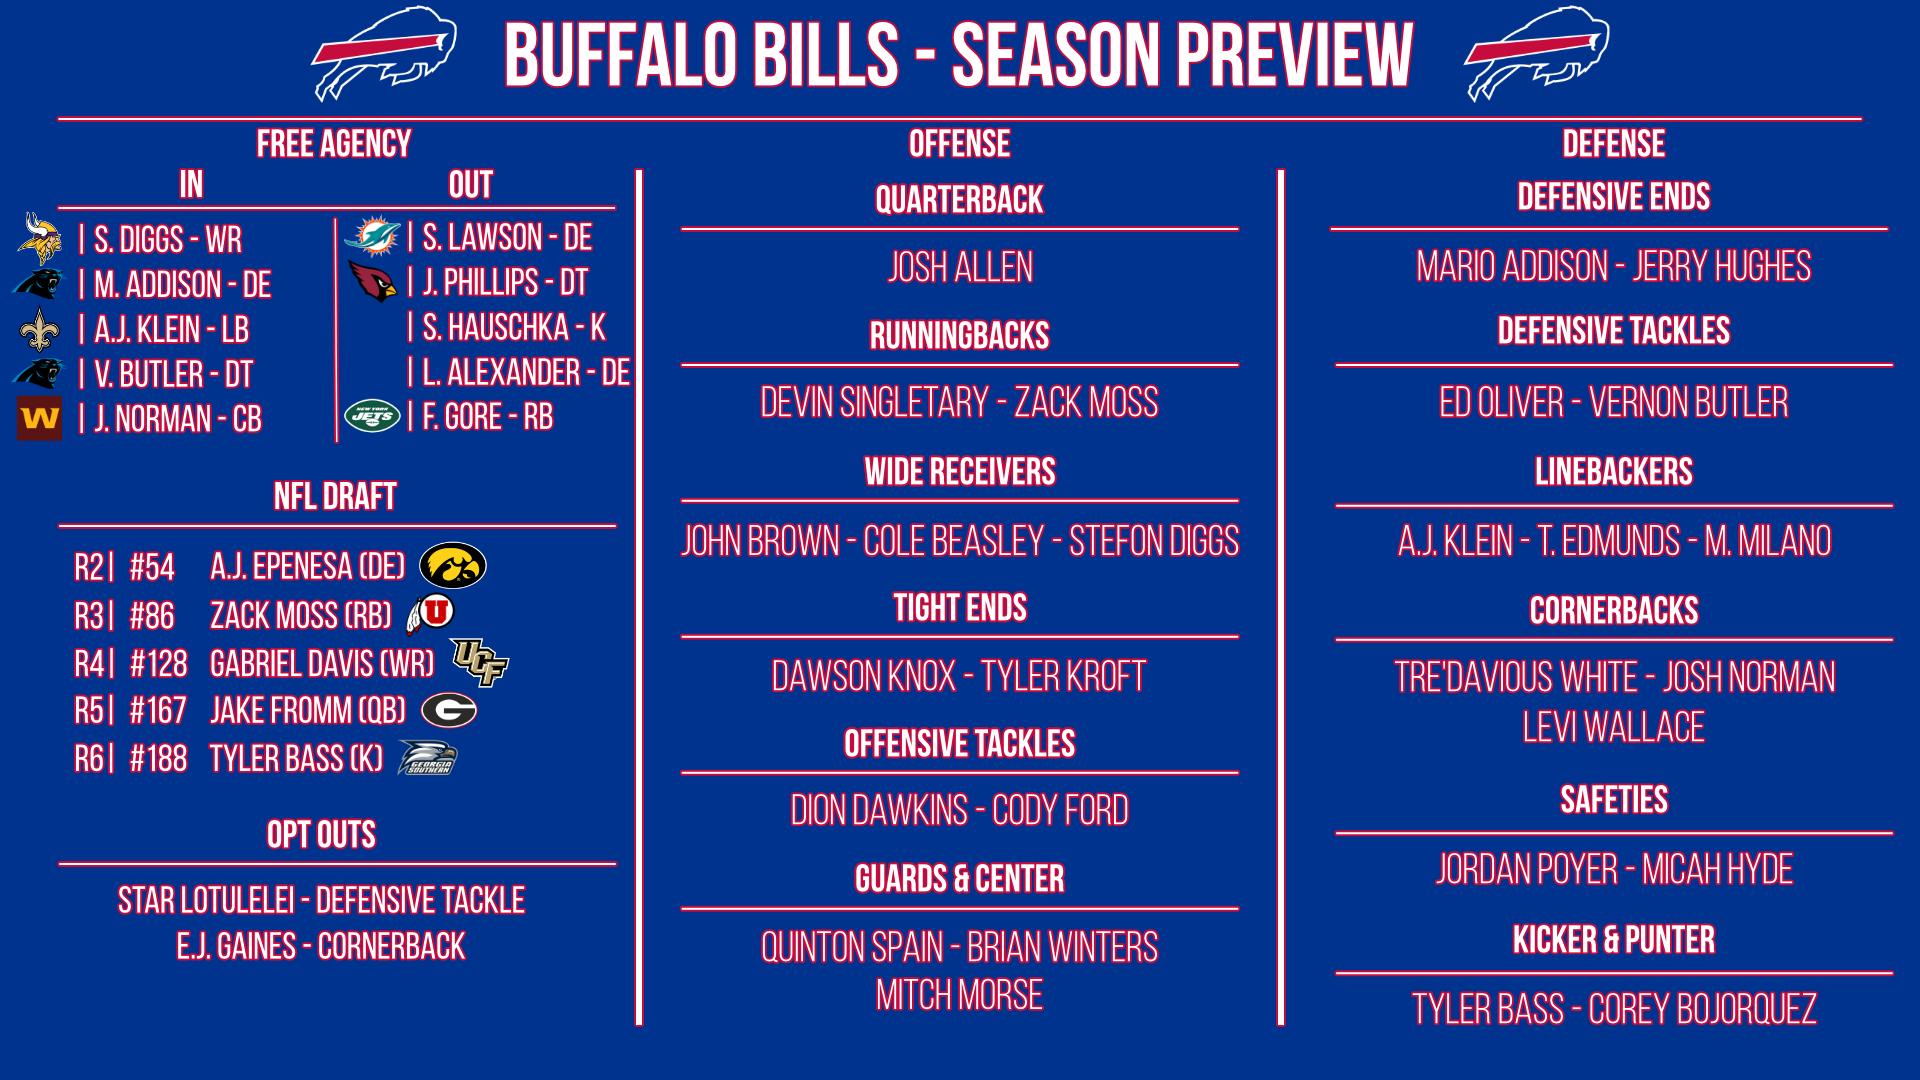 Buffalo Bills preview